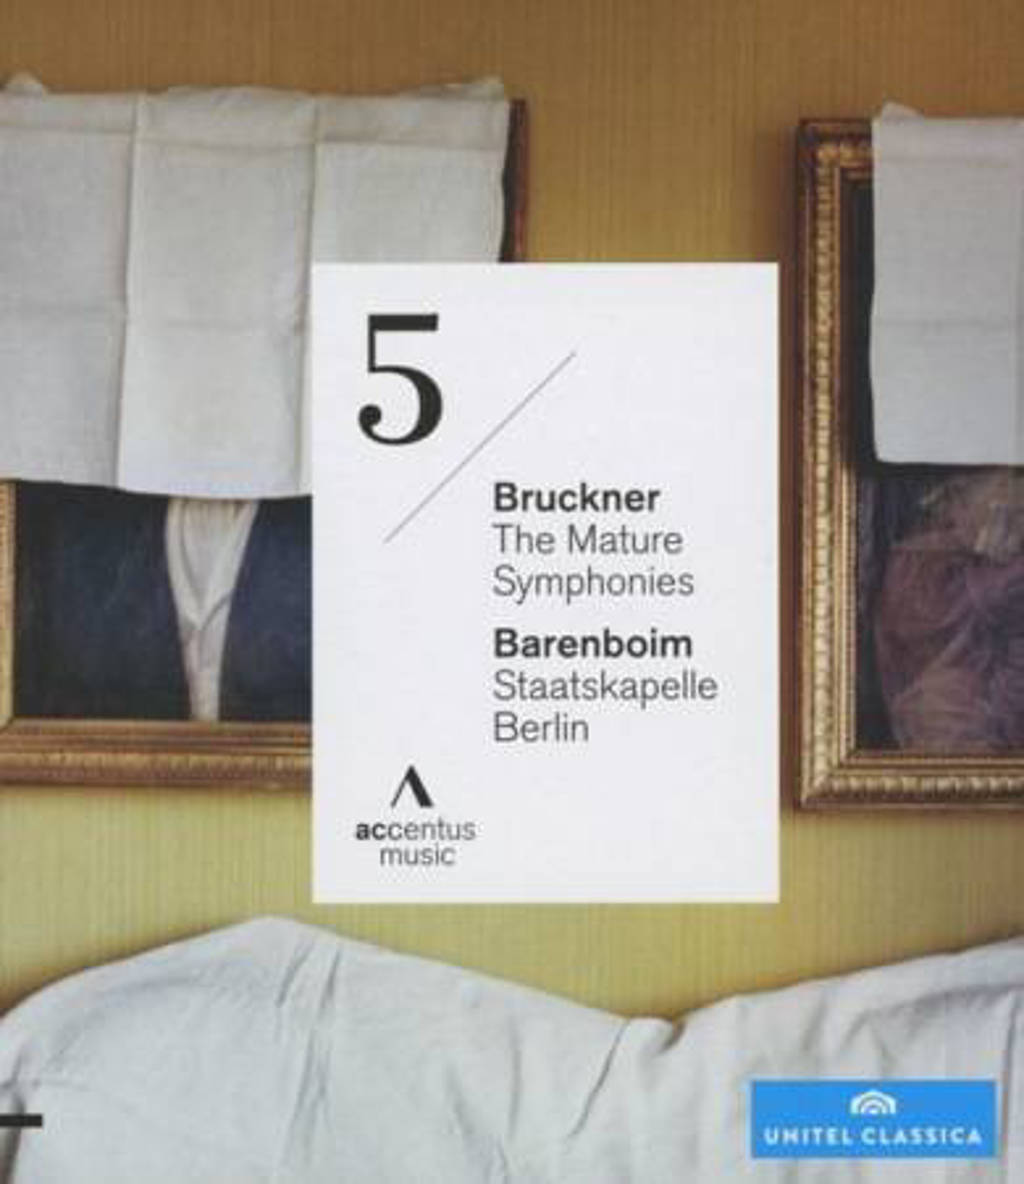 Staatskapelle Berlin - The Mature Symphonies - 5 (Blu-ray)